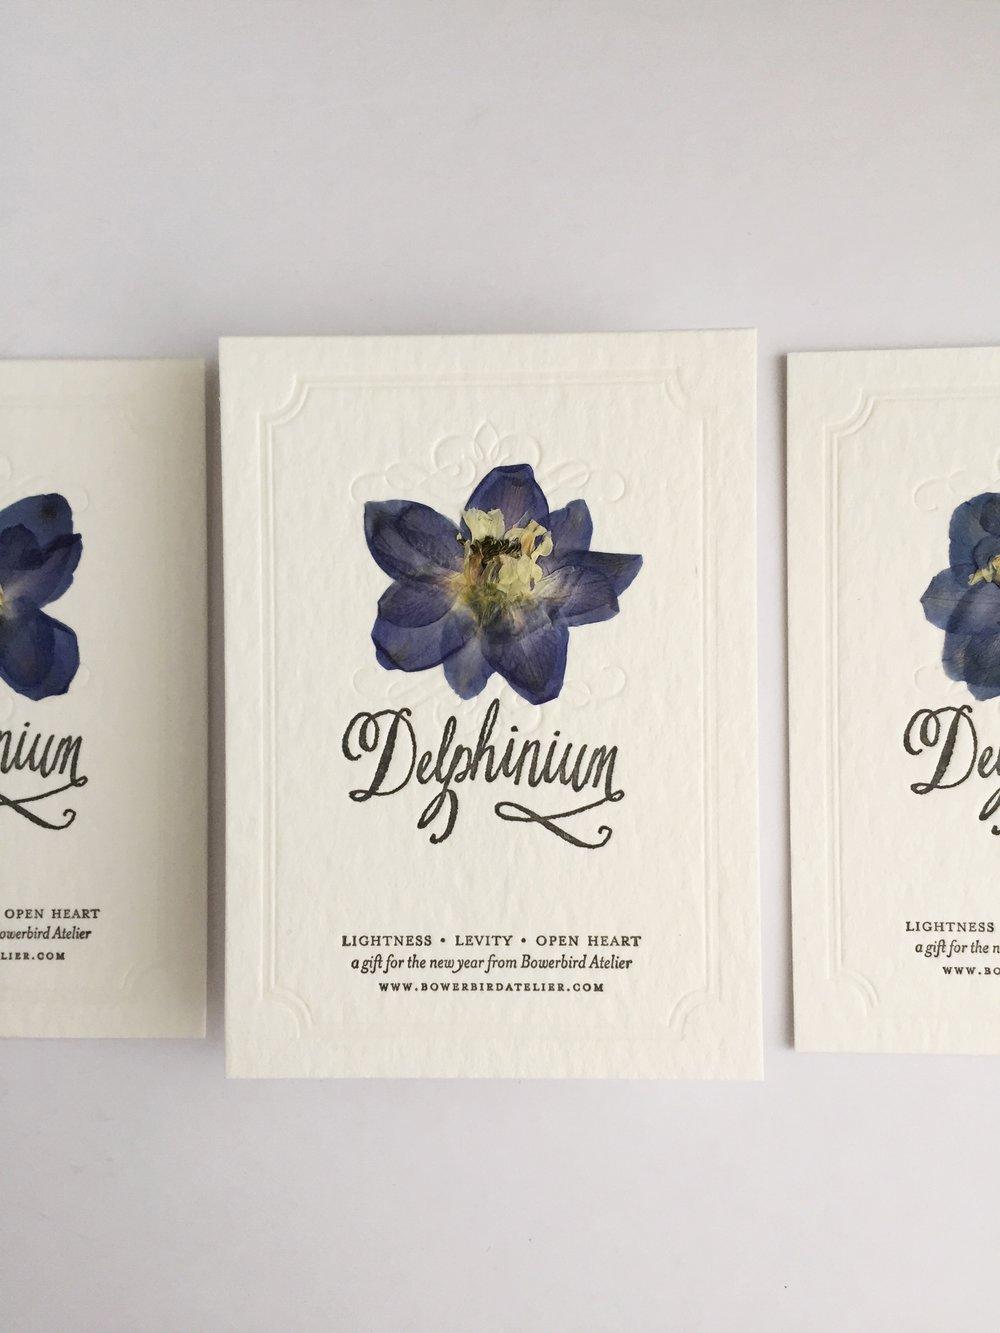 Pressed Flower Letterpress Card by Bowerbird Atelier